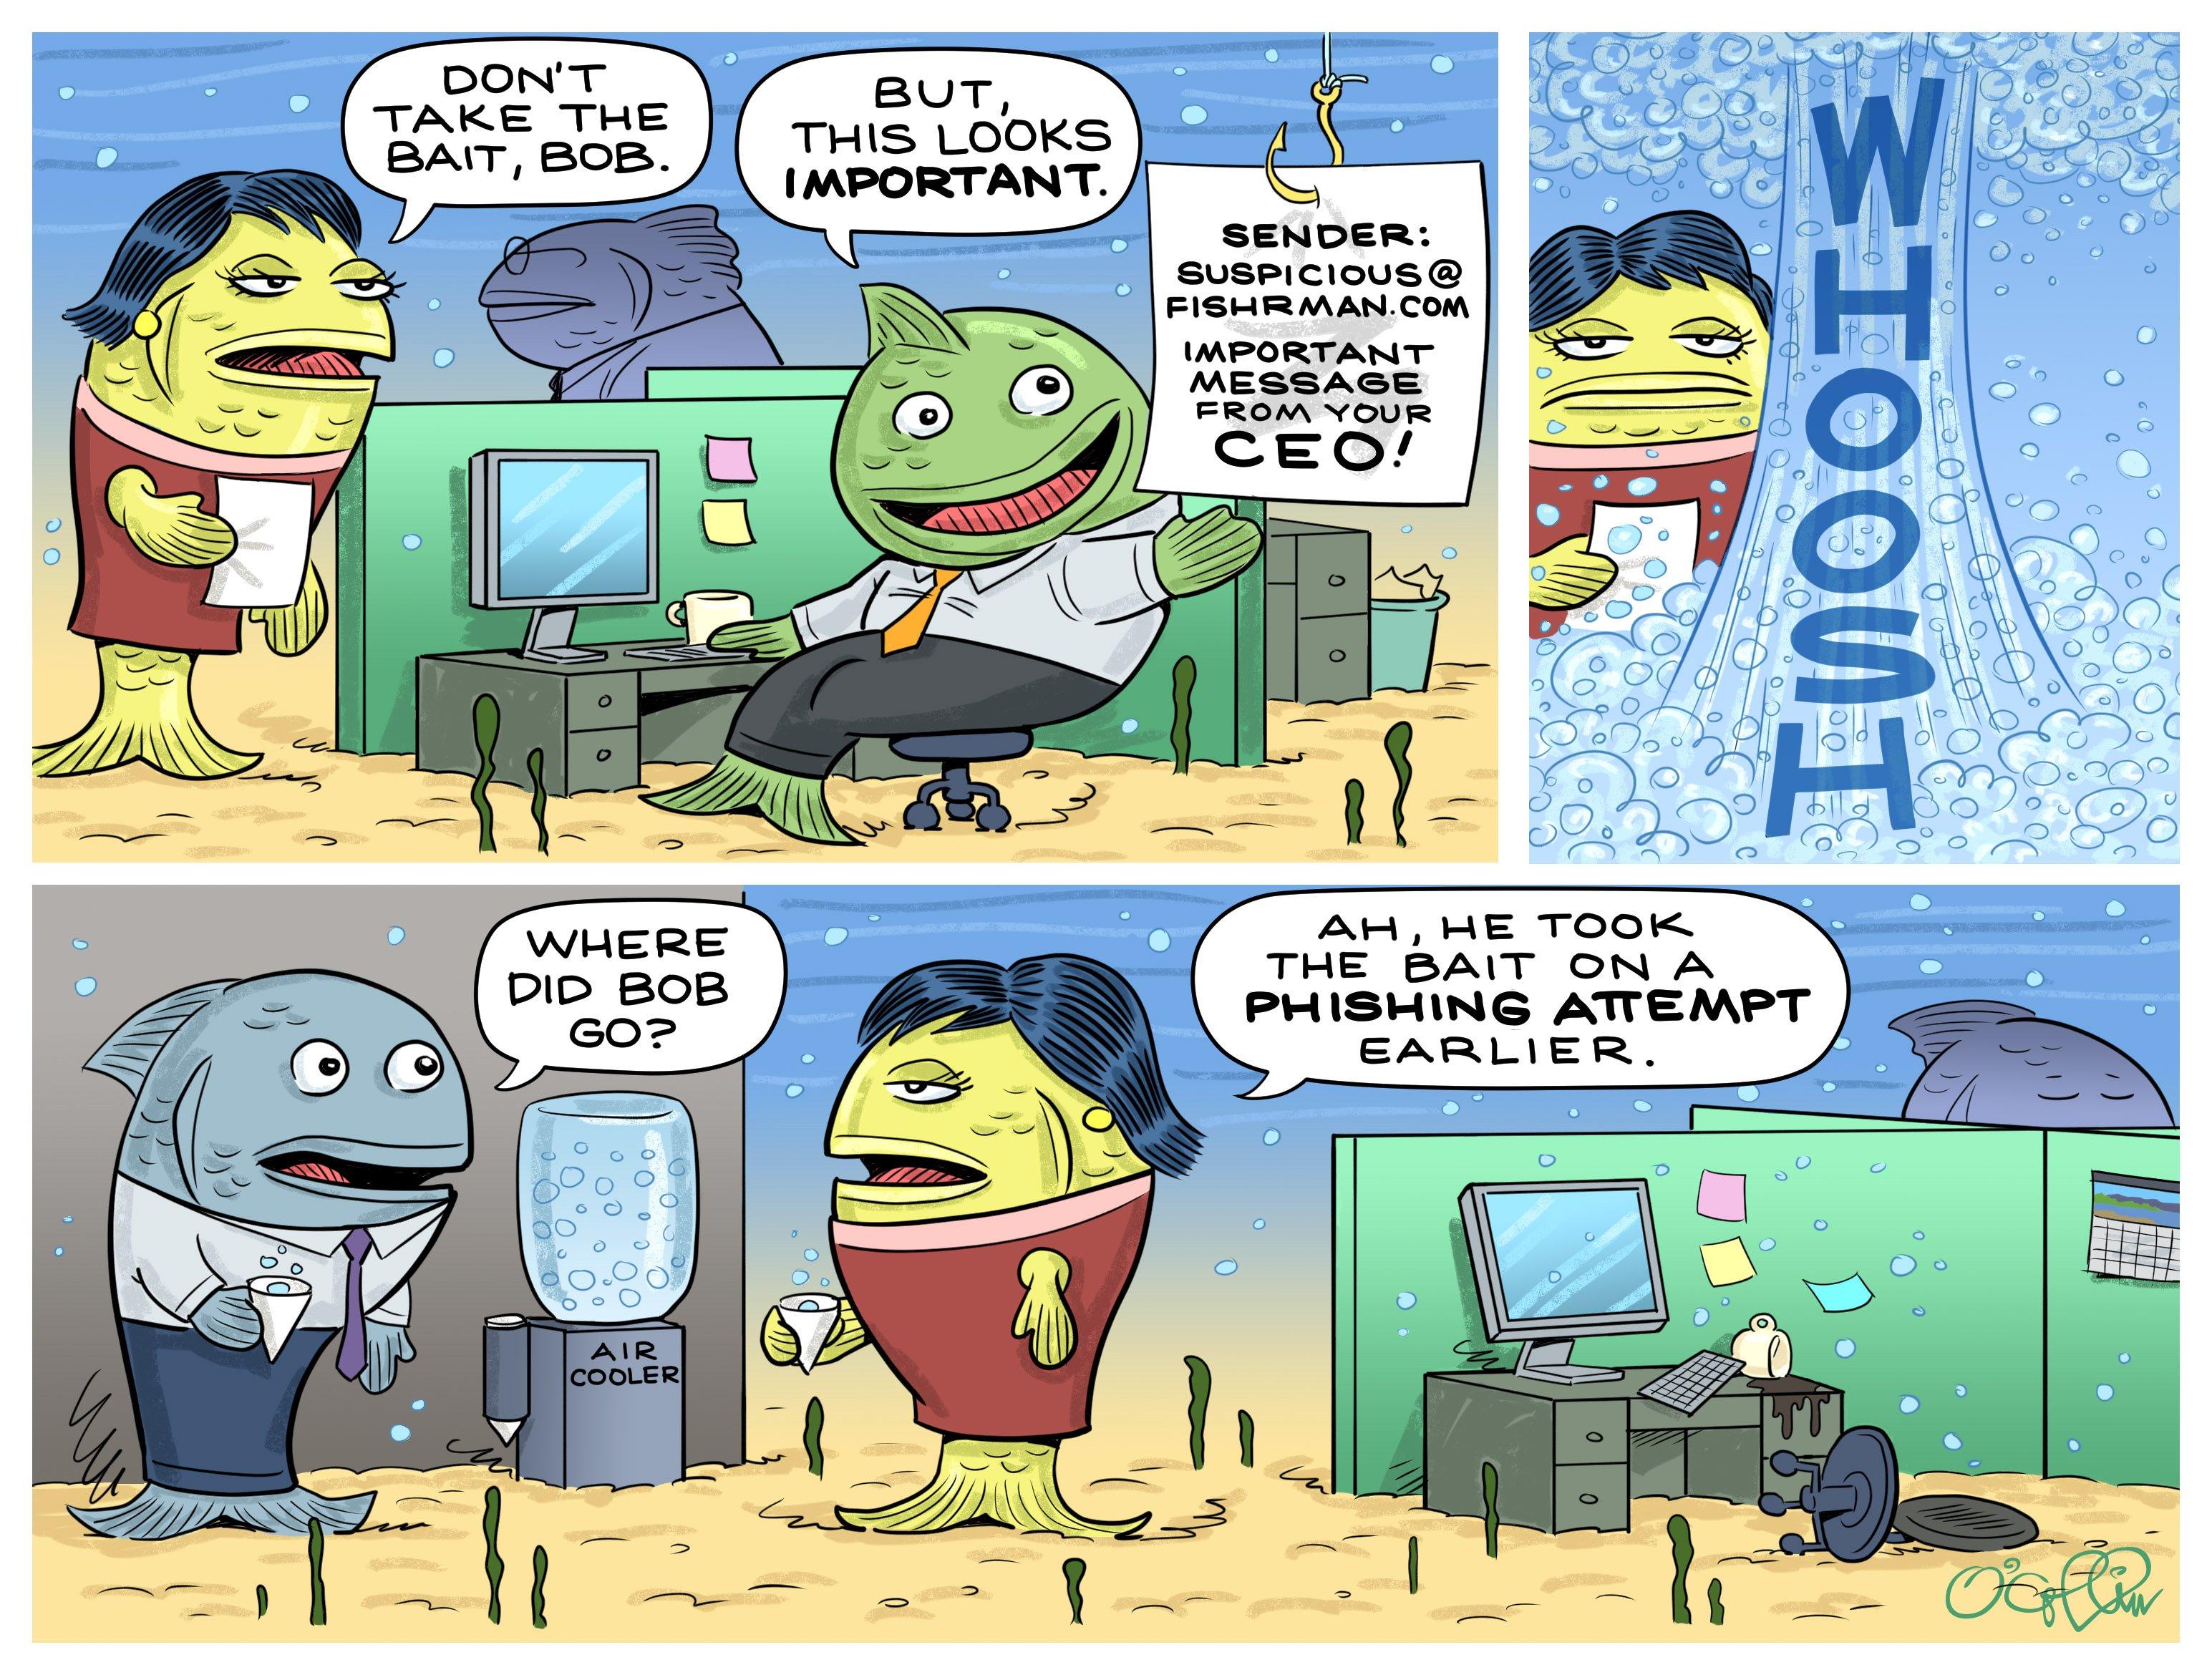 op-phishing-attack-cartoon-3090x2340